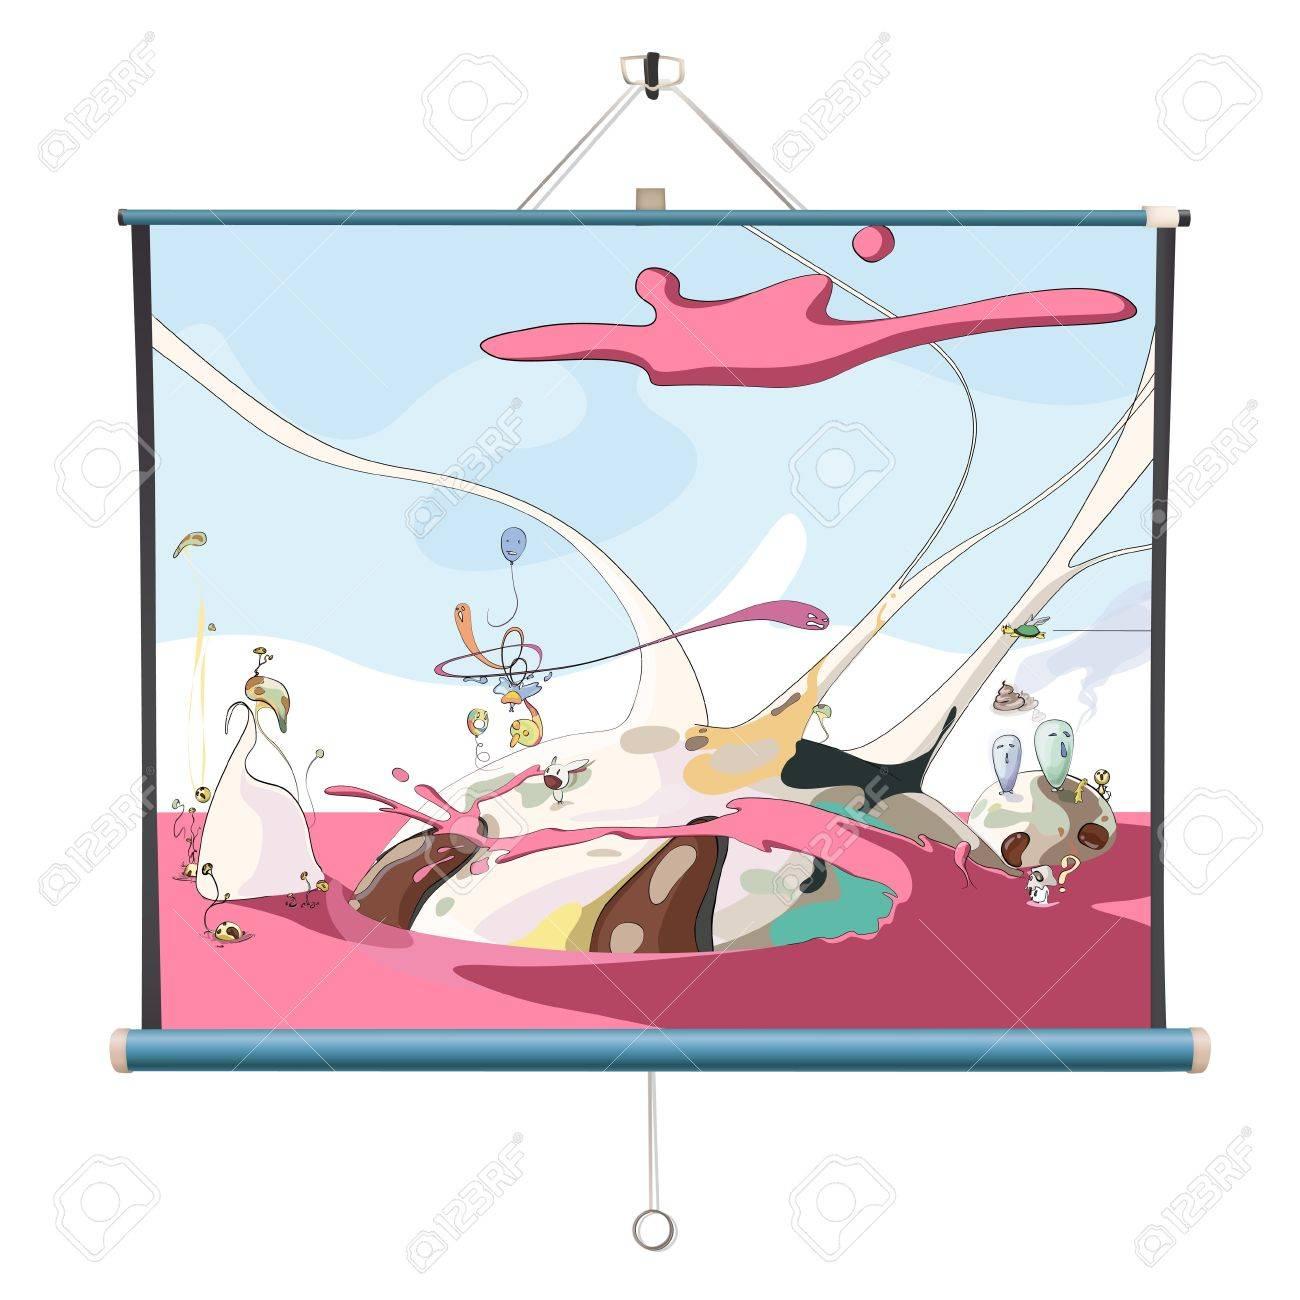 Cute draw on projector screen. Vector design. Stock Vector - 18541604